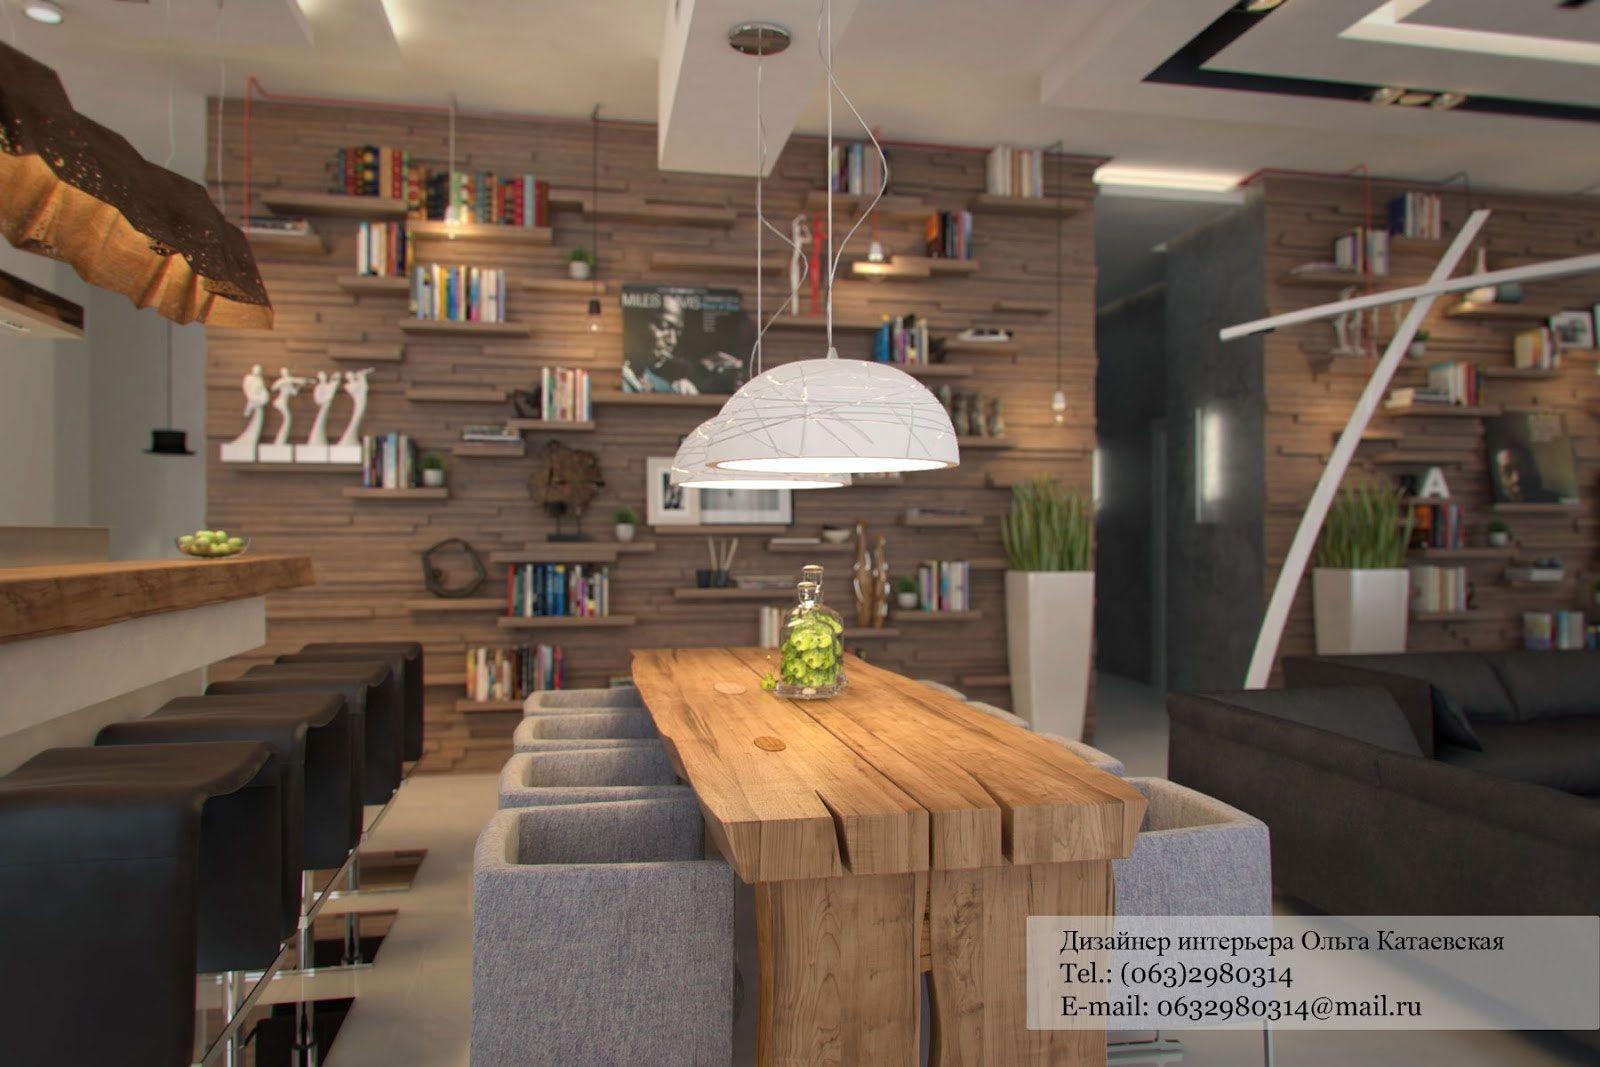 Small Modern Rustic Studio Apartment Interior Lighting Decorating